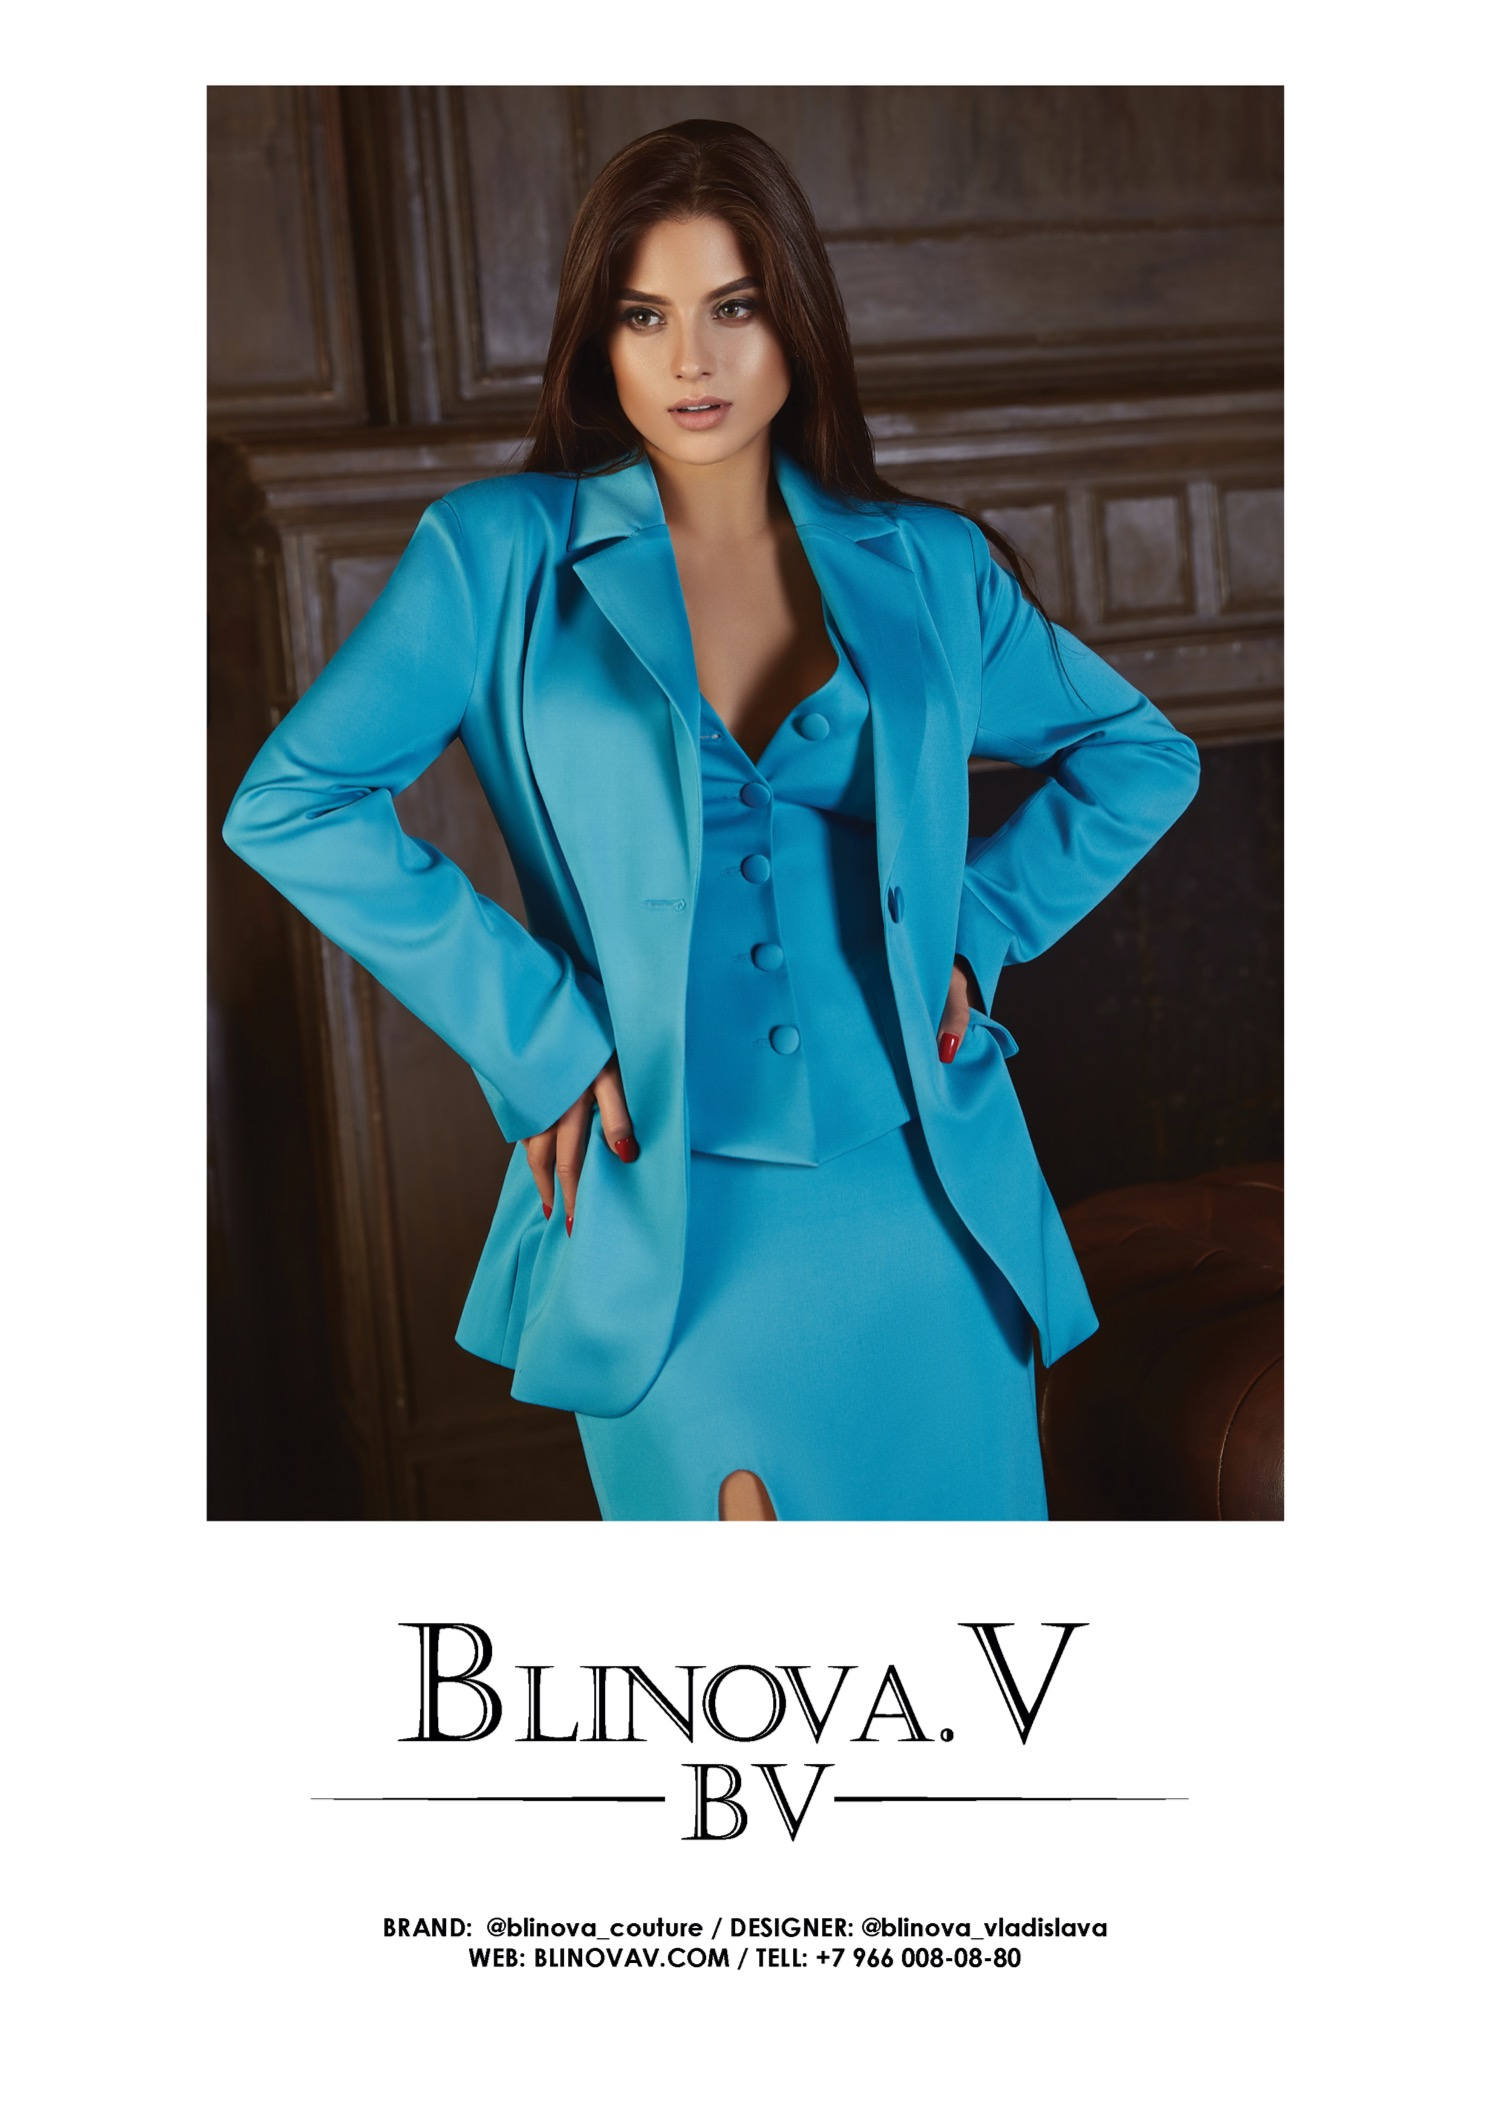 BLOGGMAGAZINE_blinova_vladislava_couture